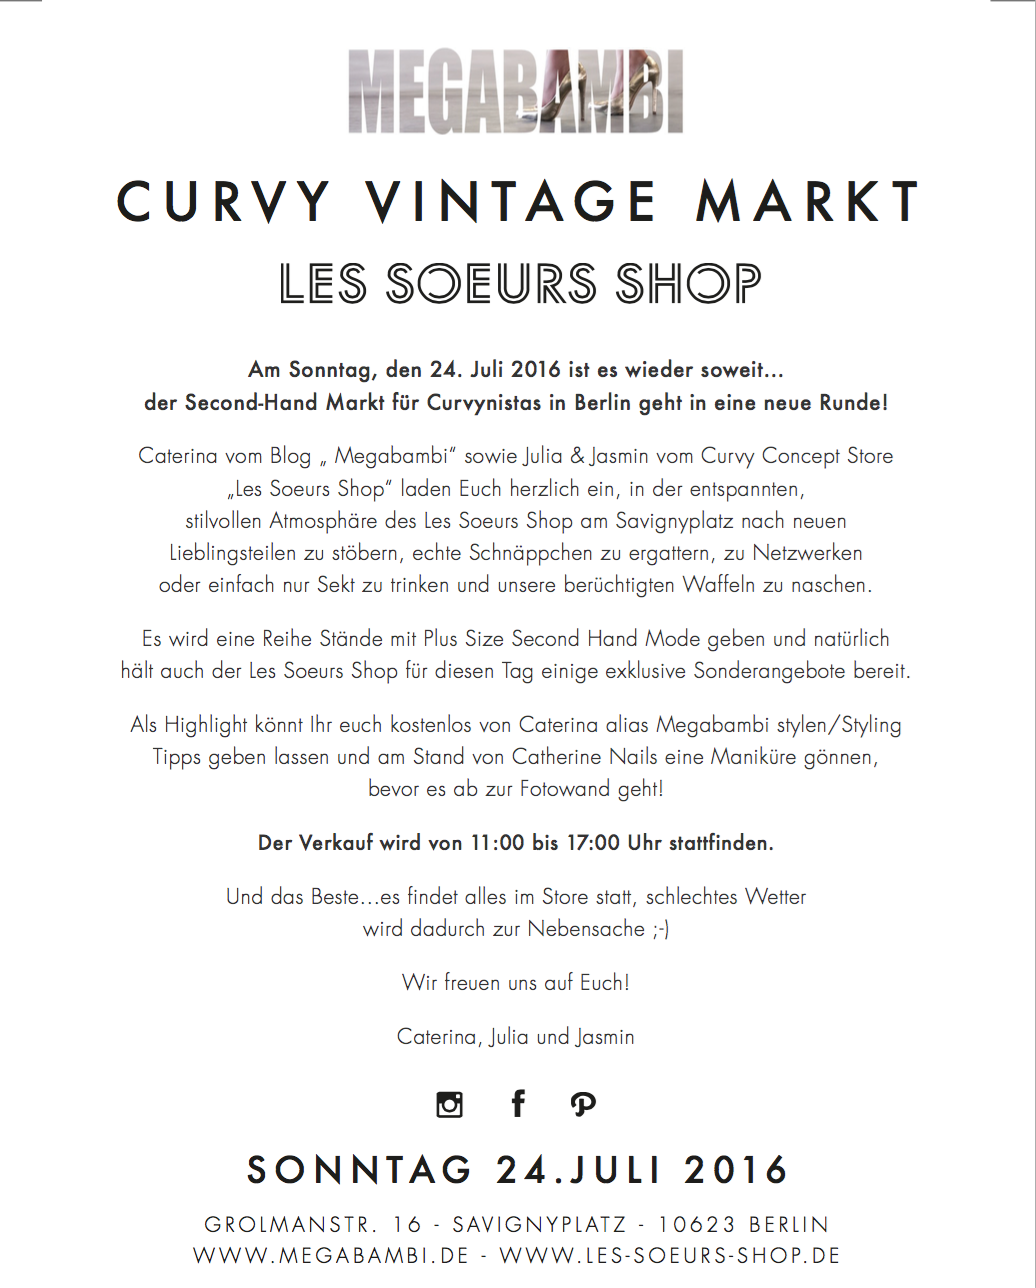 Megabambis-Curvy-Vinatge -Markt-Les soeurs-shop-MegabambiBlog